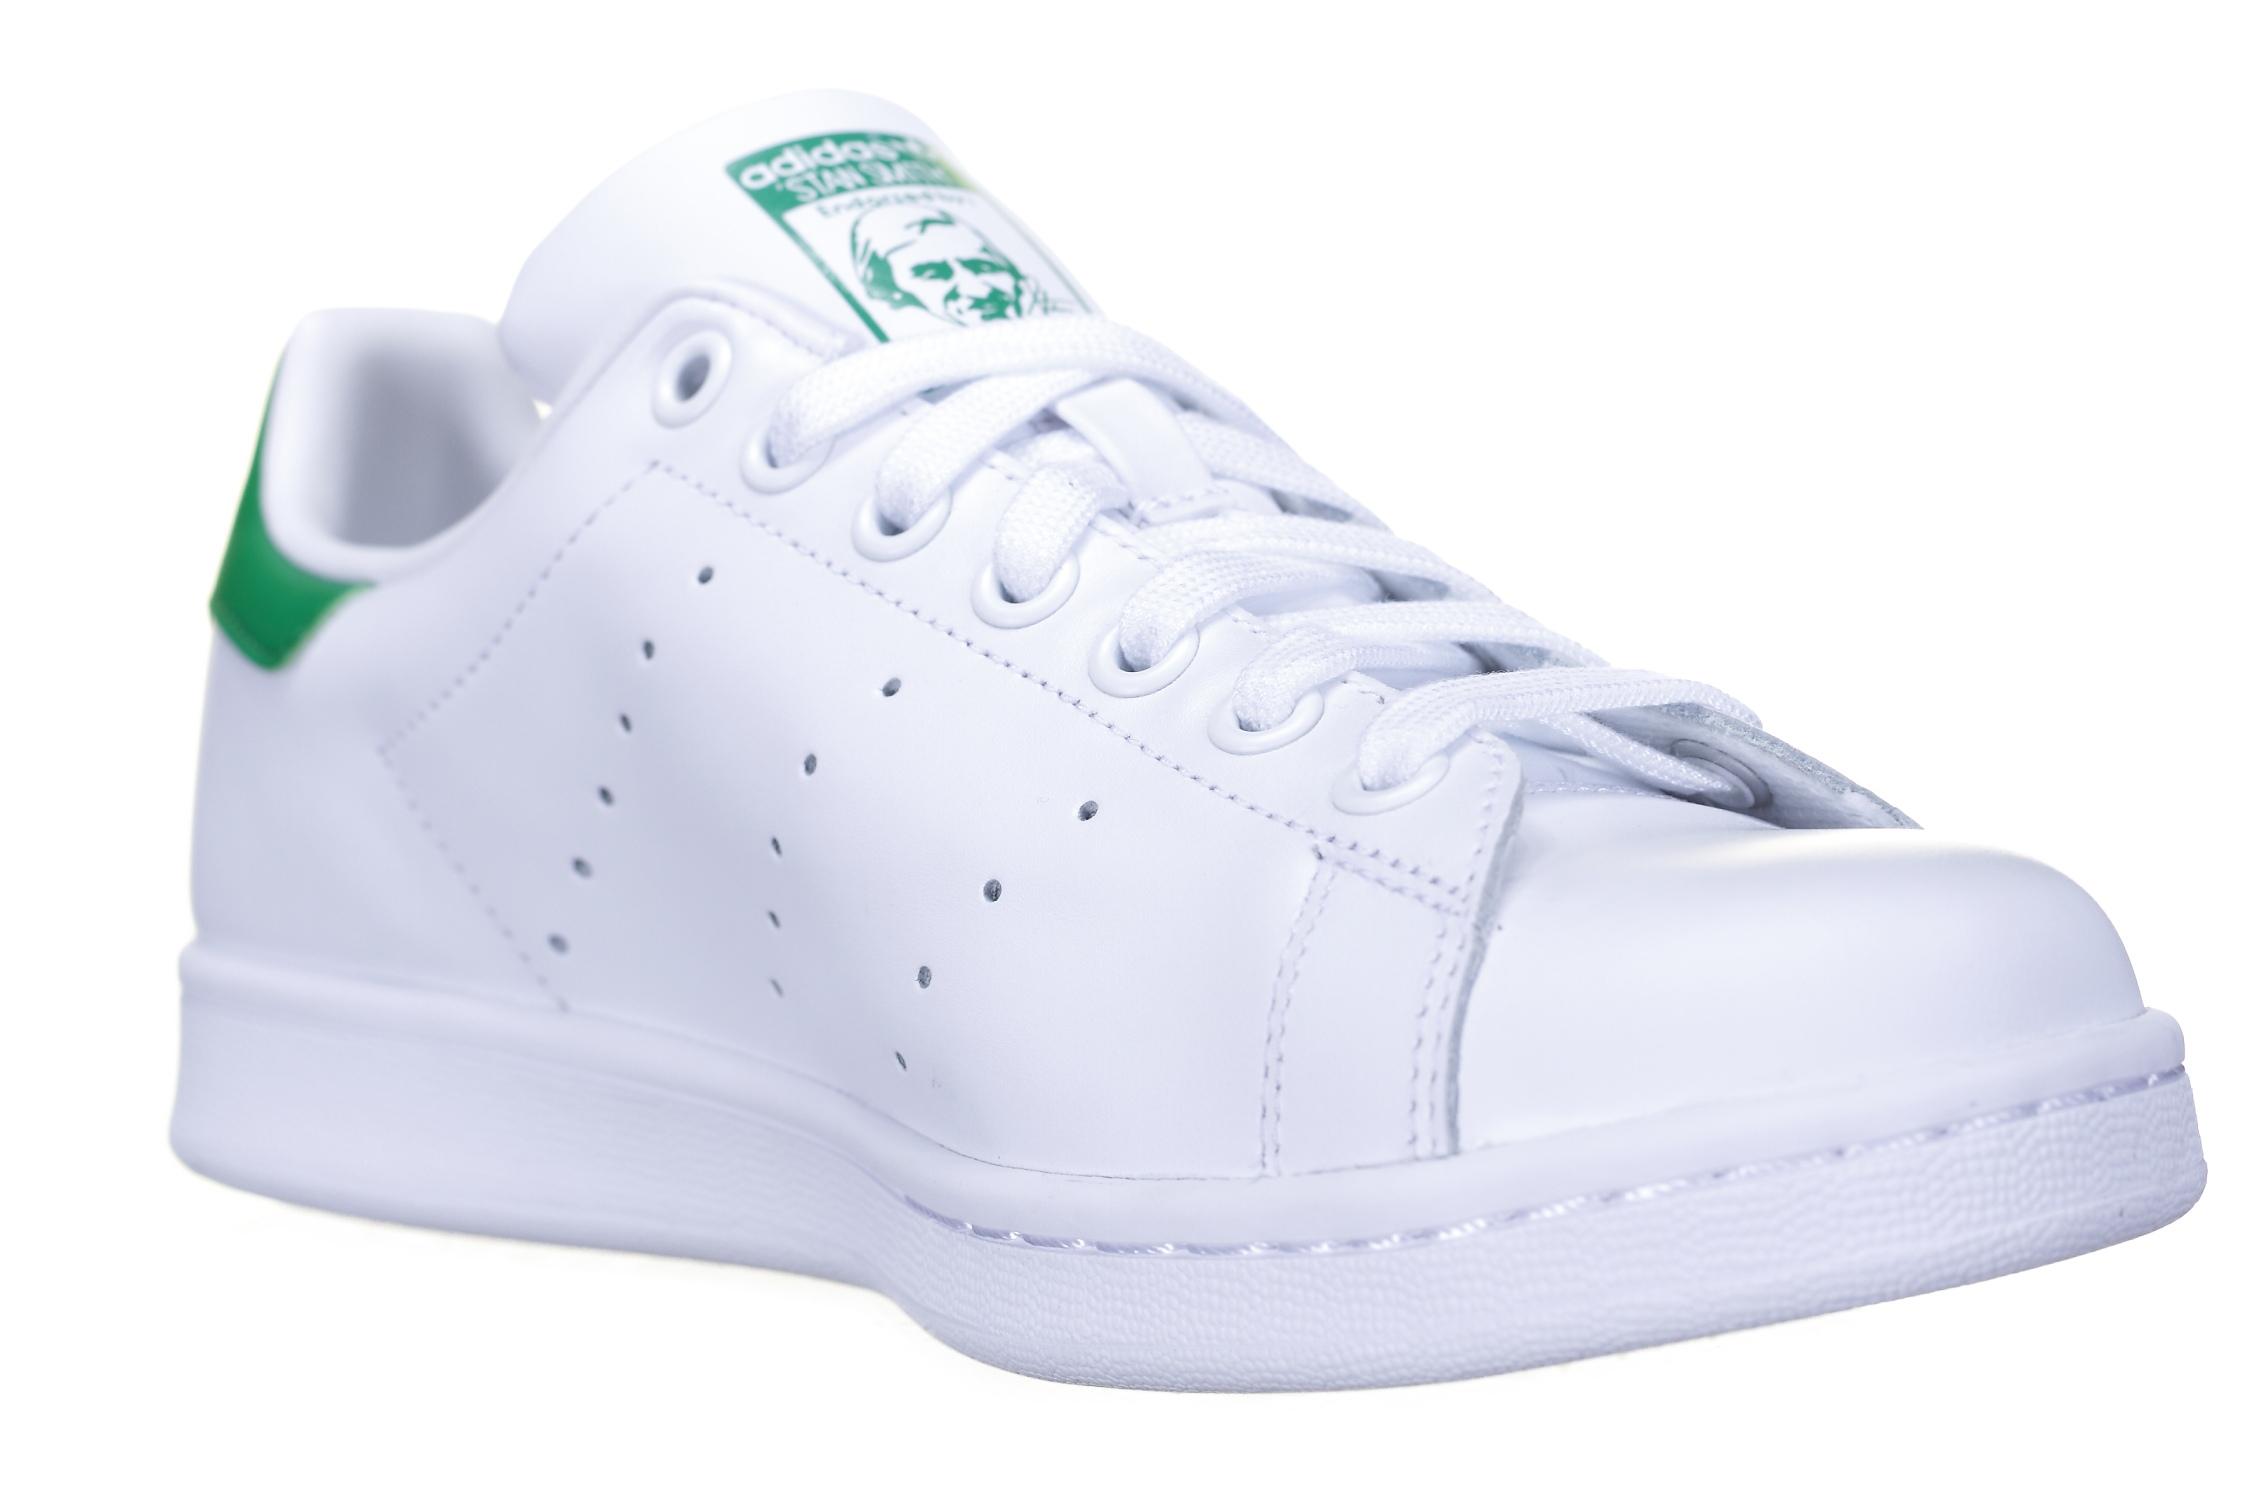 https://www.leadermode.com/70902/adidas-stan-smith-blanc-vert.jpg